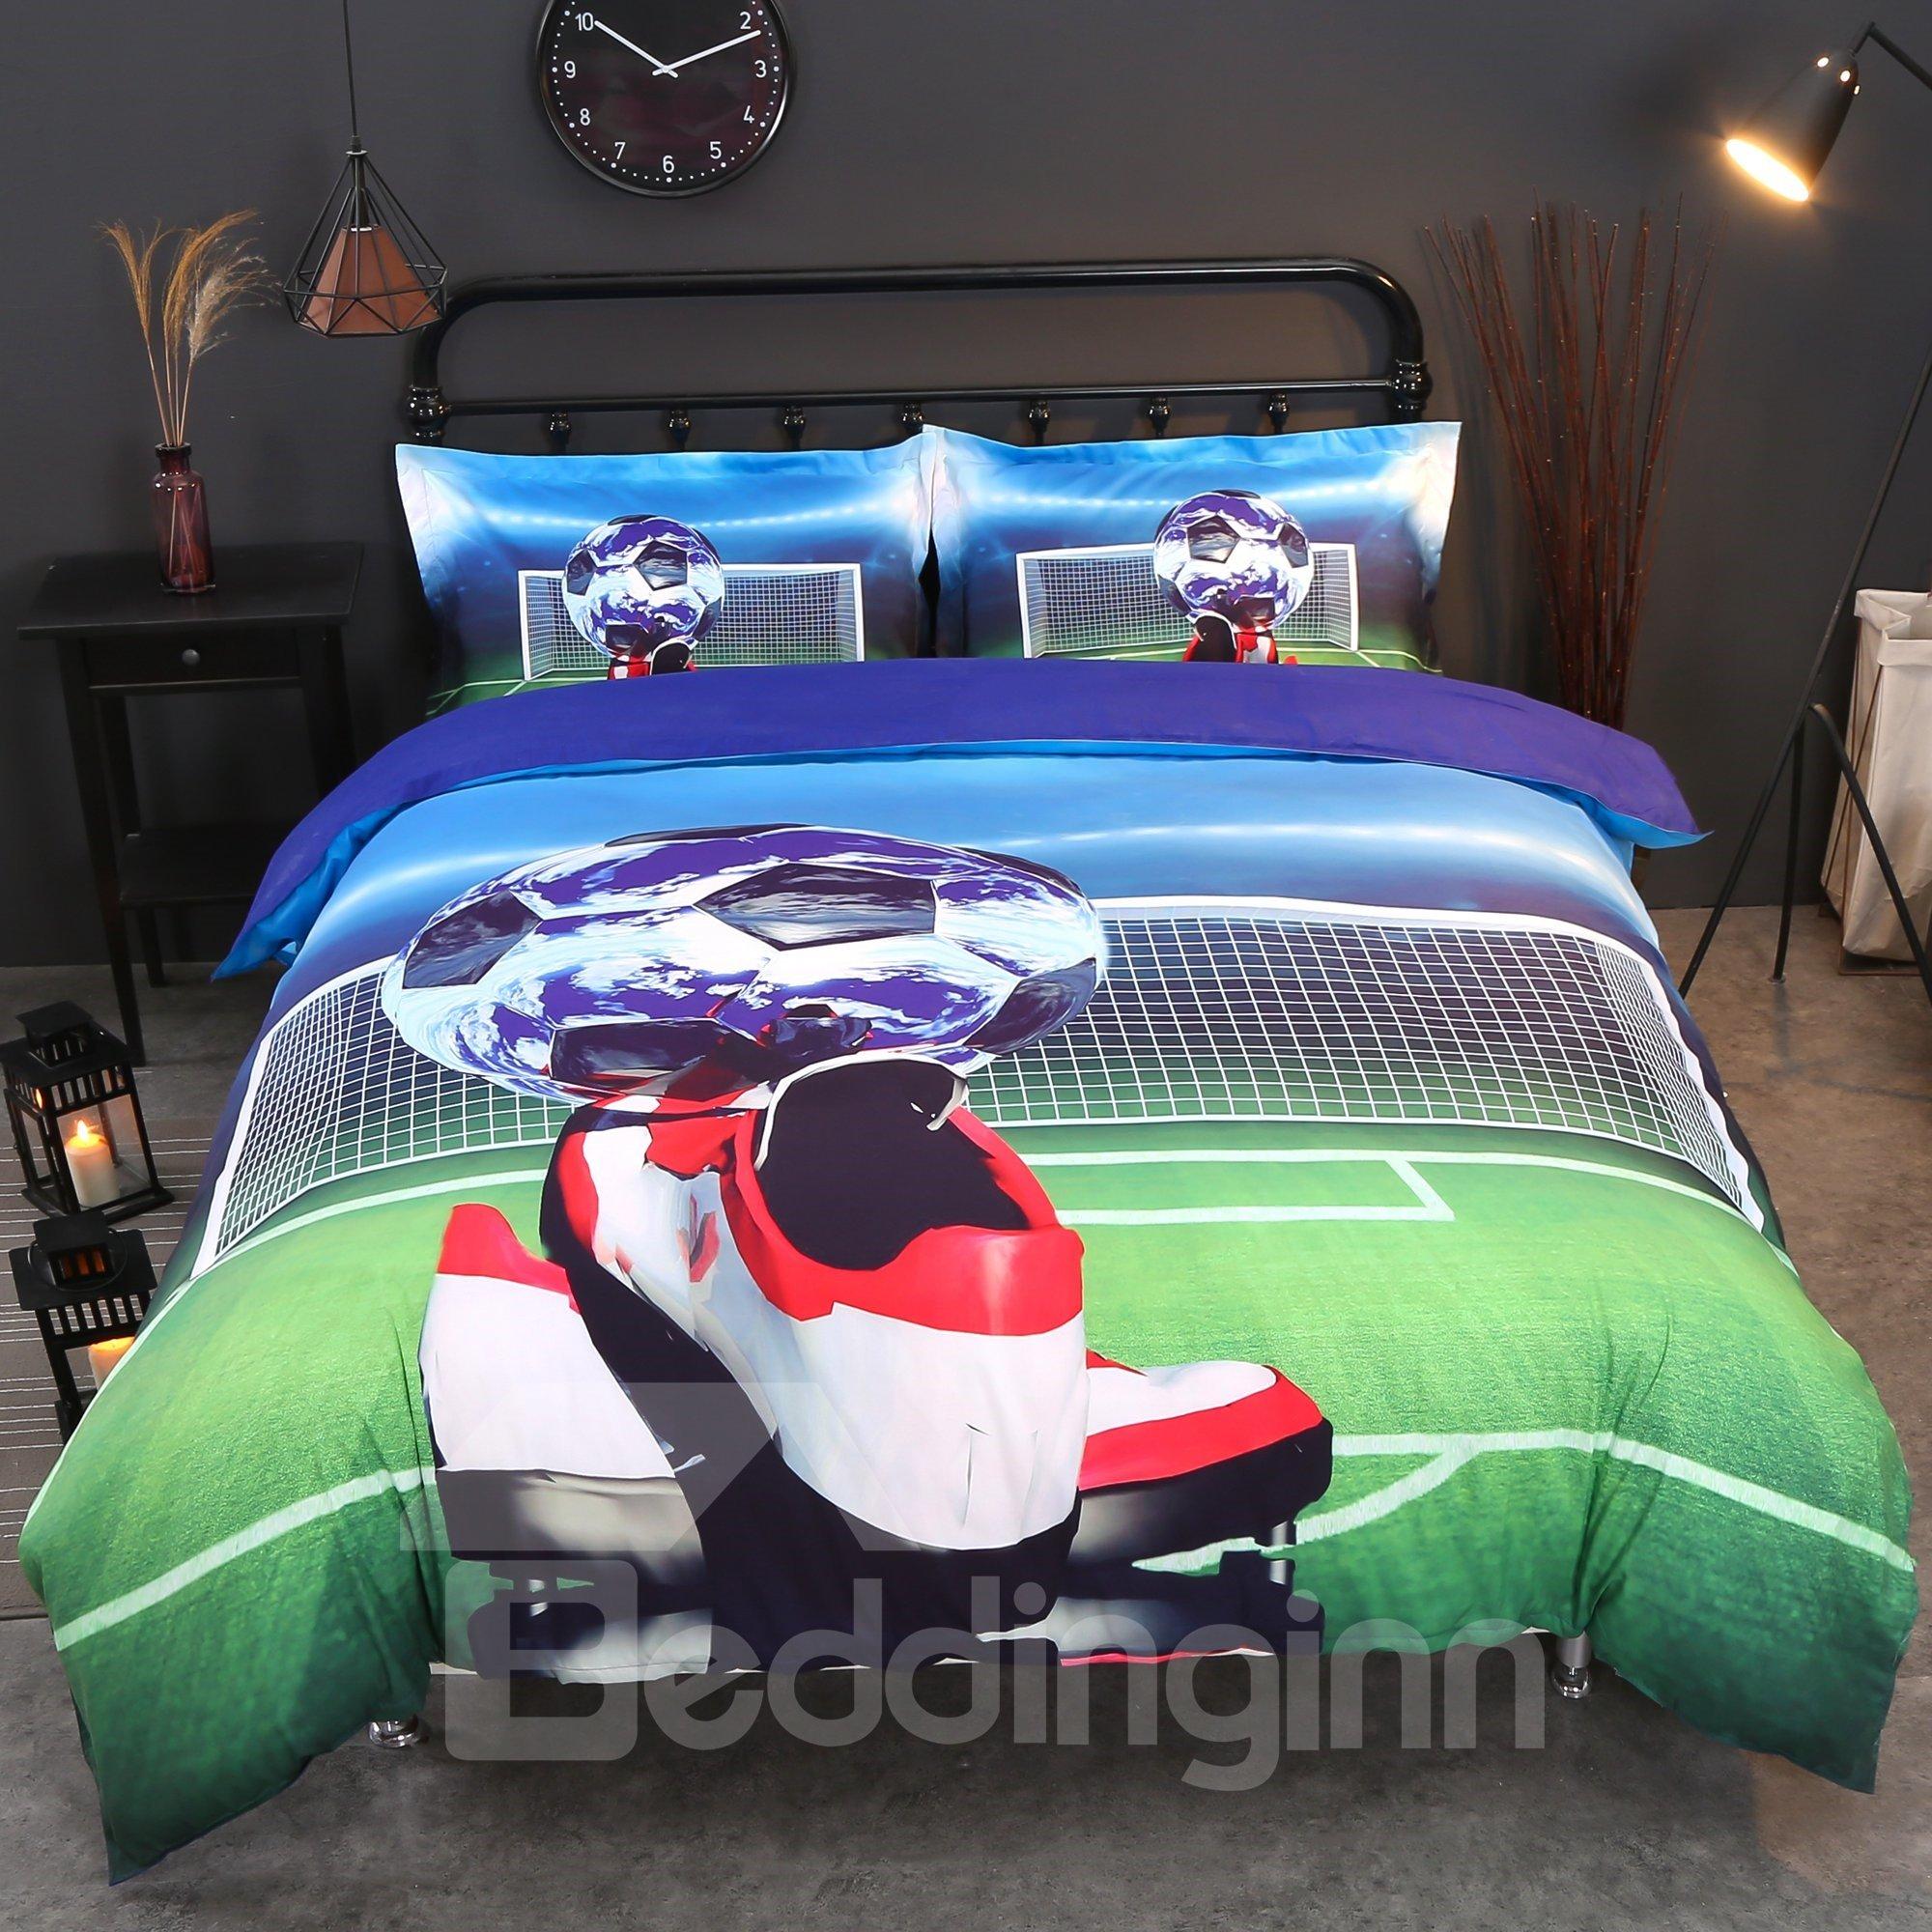 homeware c soccer nz q bed buy fishpond cover co original bedding online duvet from football